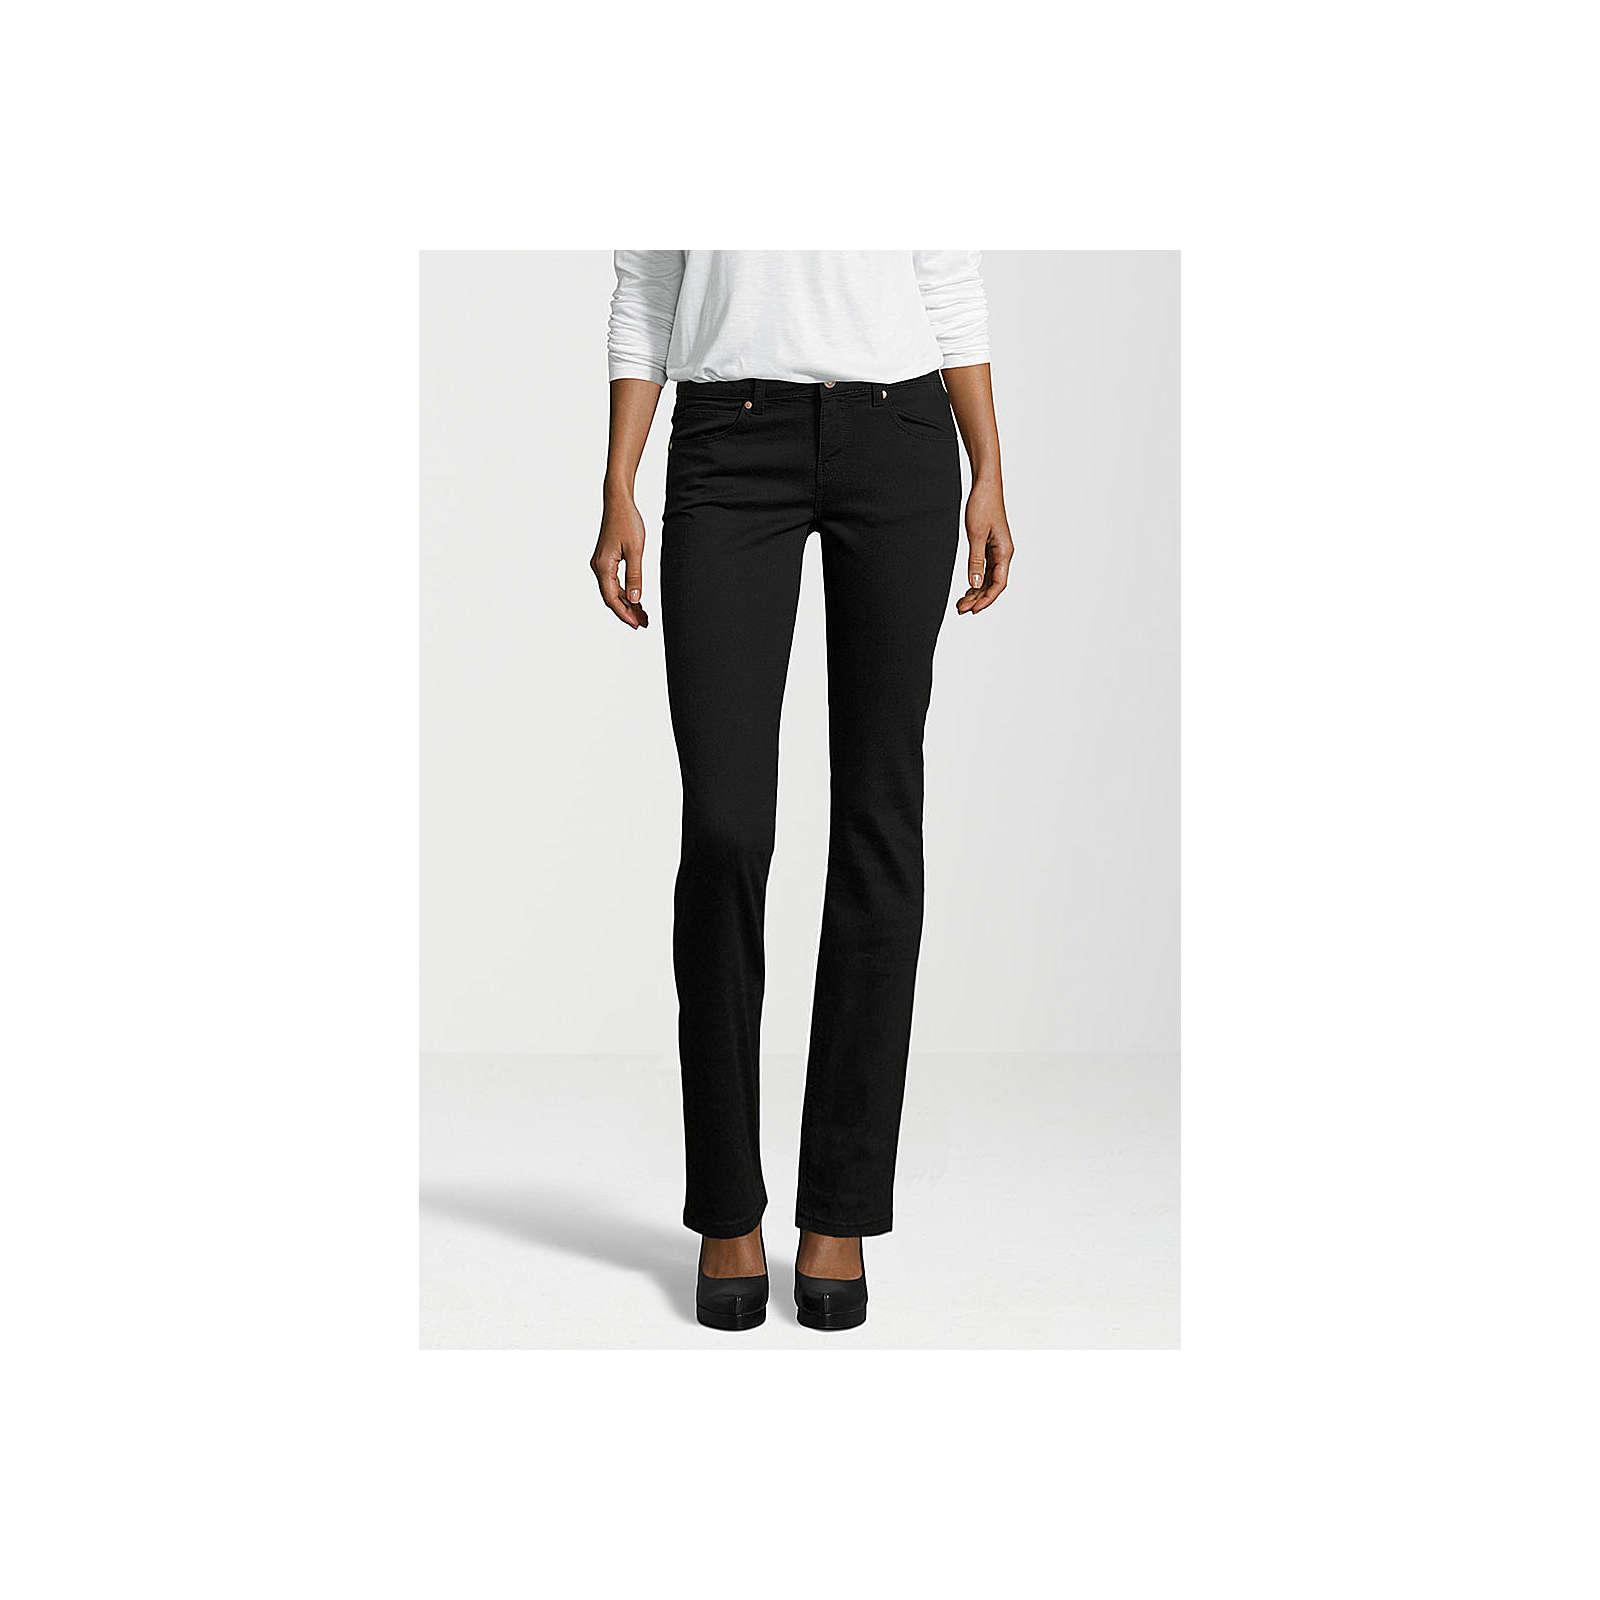 Gin Tonic Jeans STRAIGHT black Jeanshosen schwarz Damen Gr. W30/L32